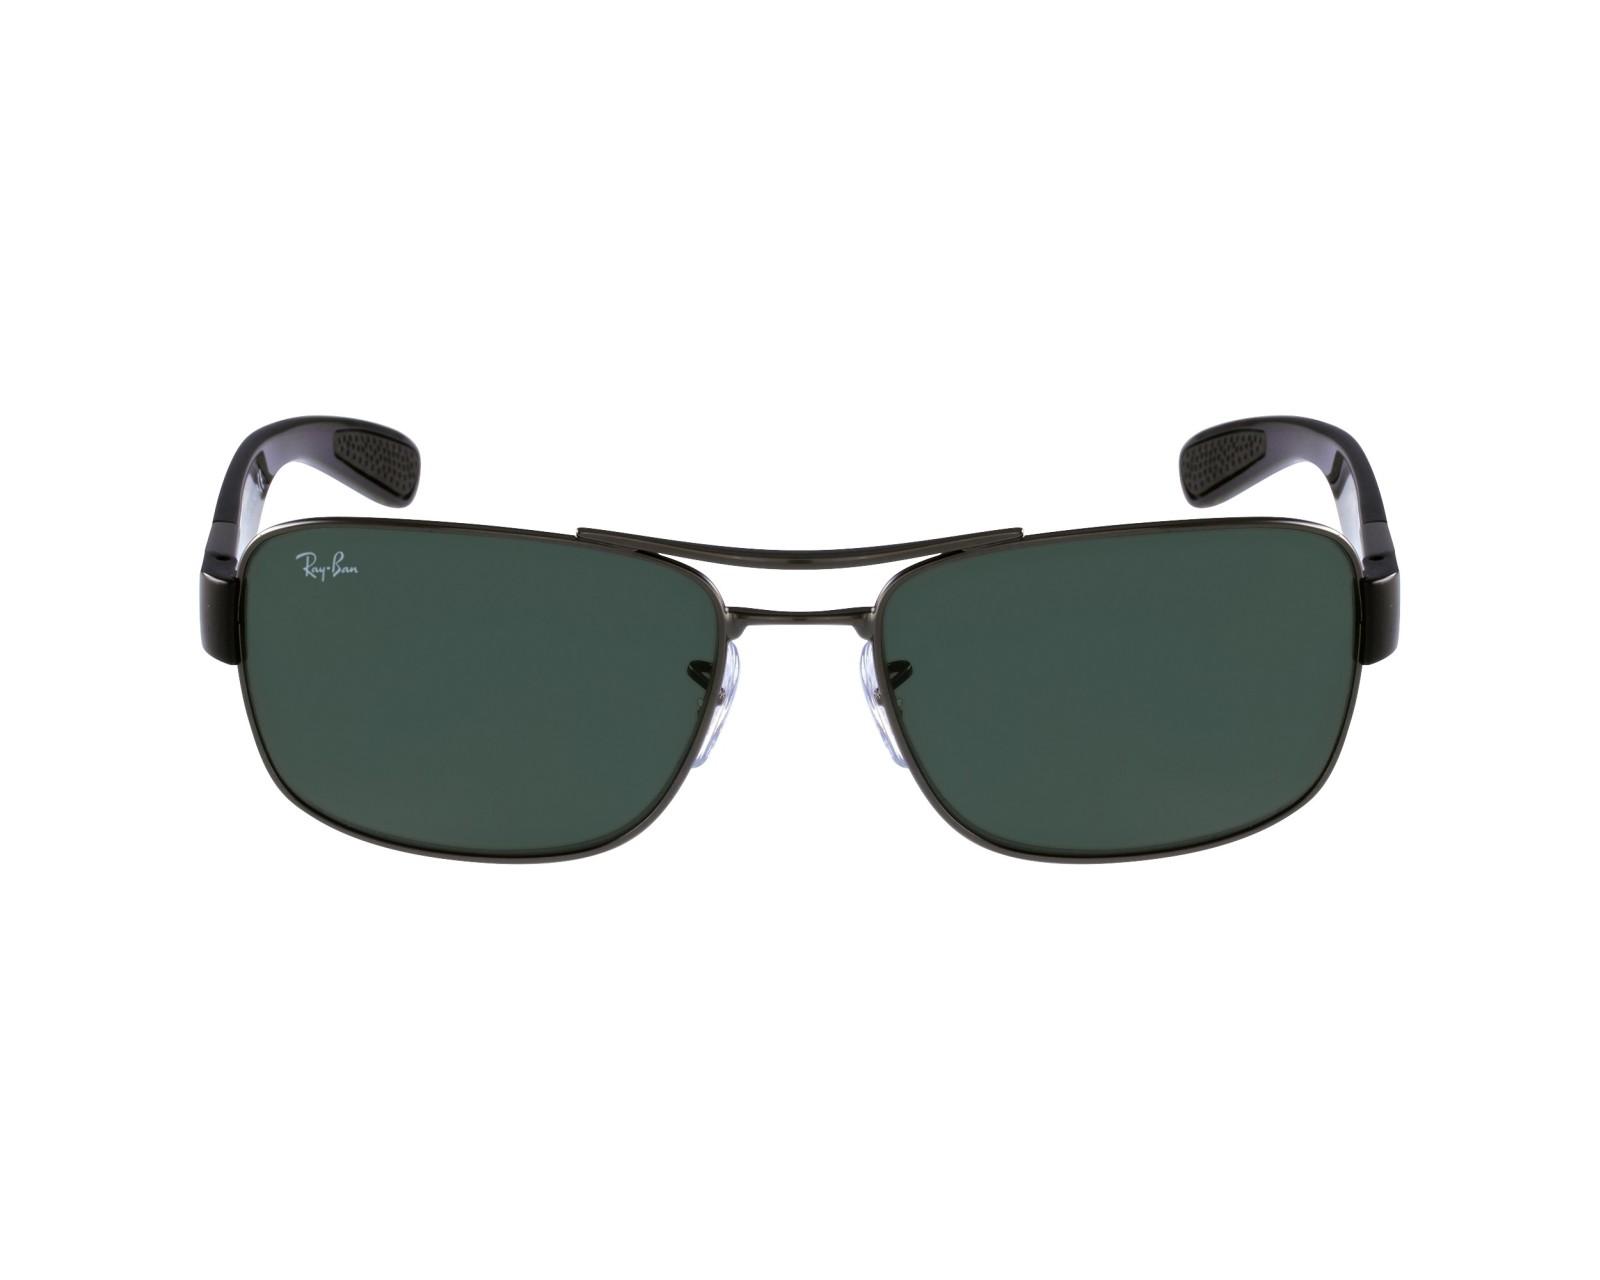 c1c5c54d6b9 thumbnail Sunglasses Ray-Ban RB-3522 004 71 - Gun Black profile view